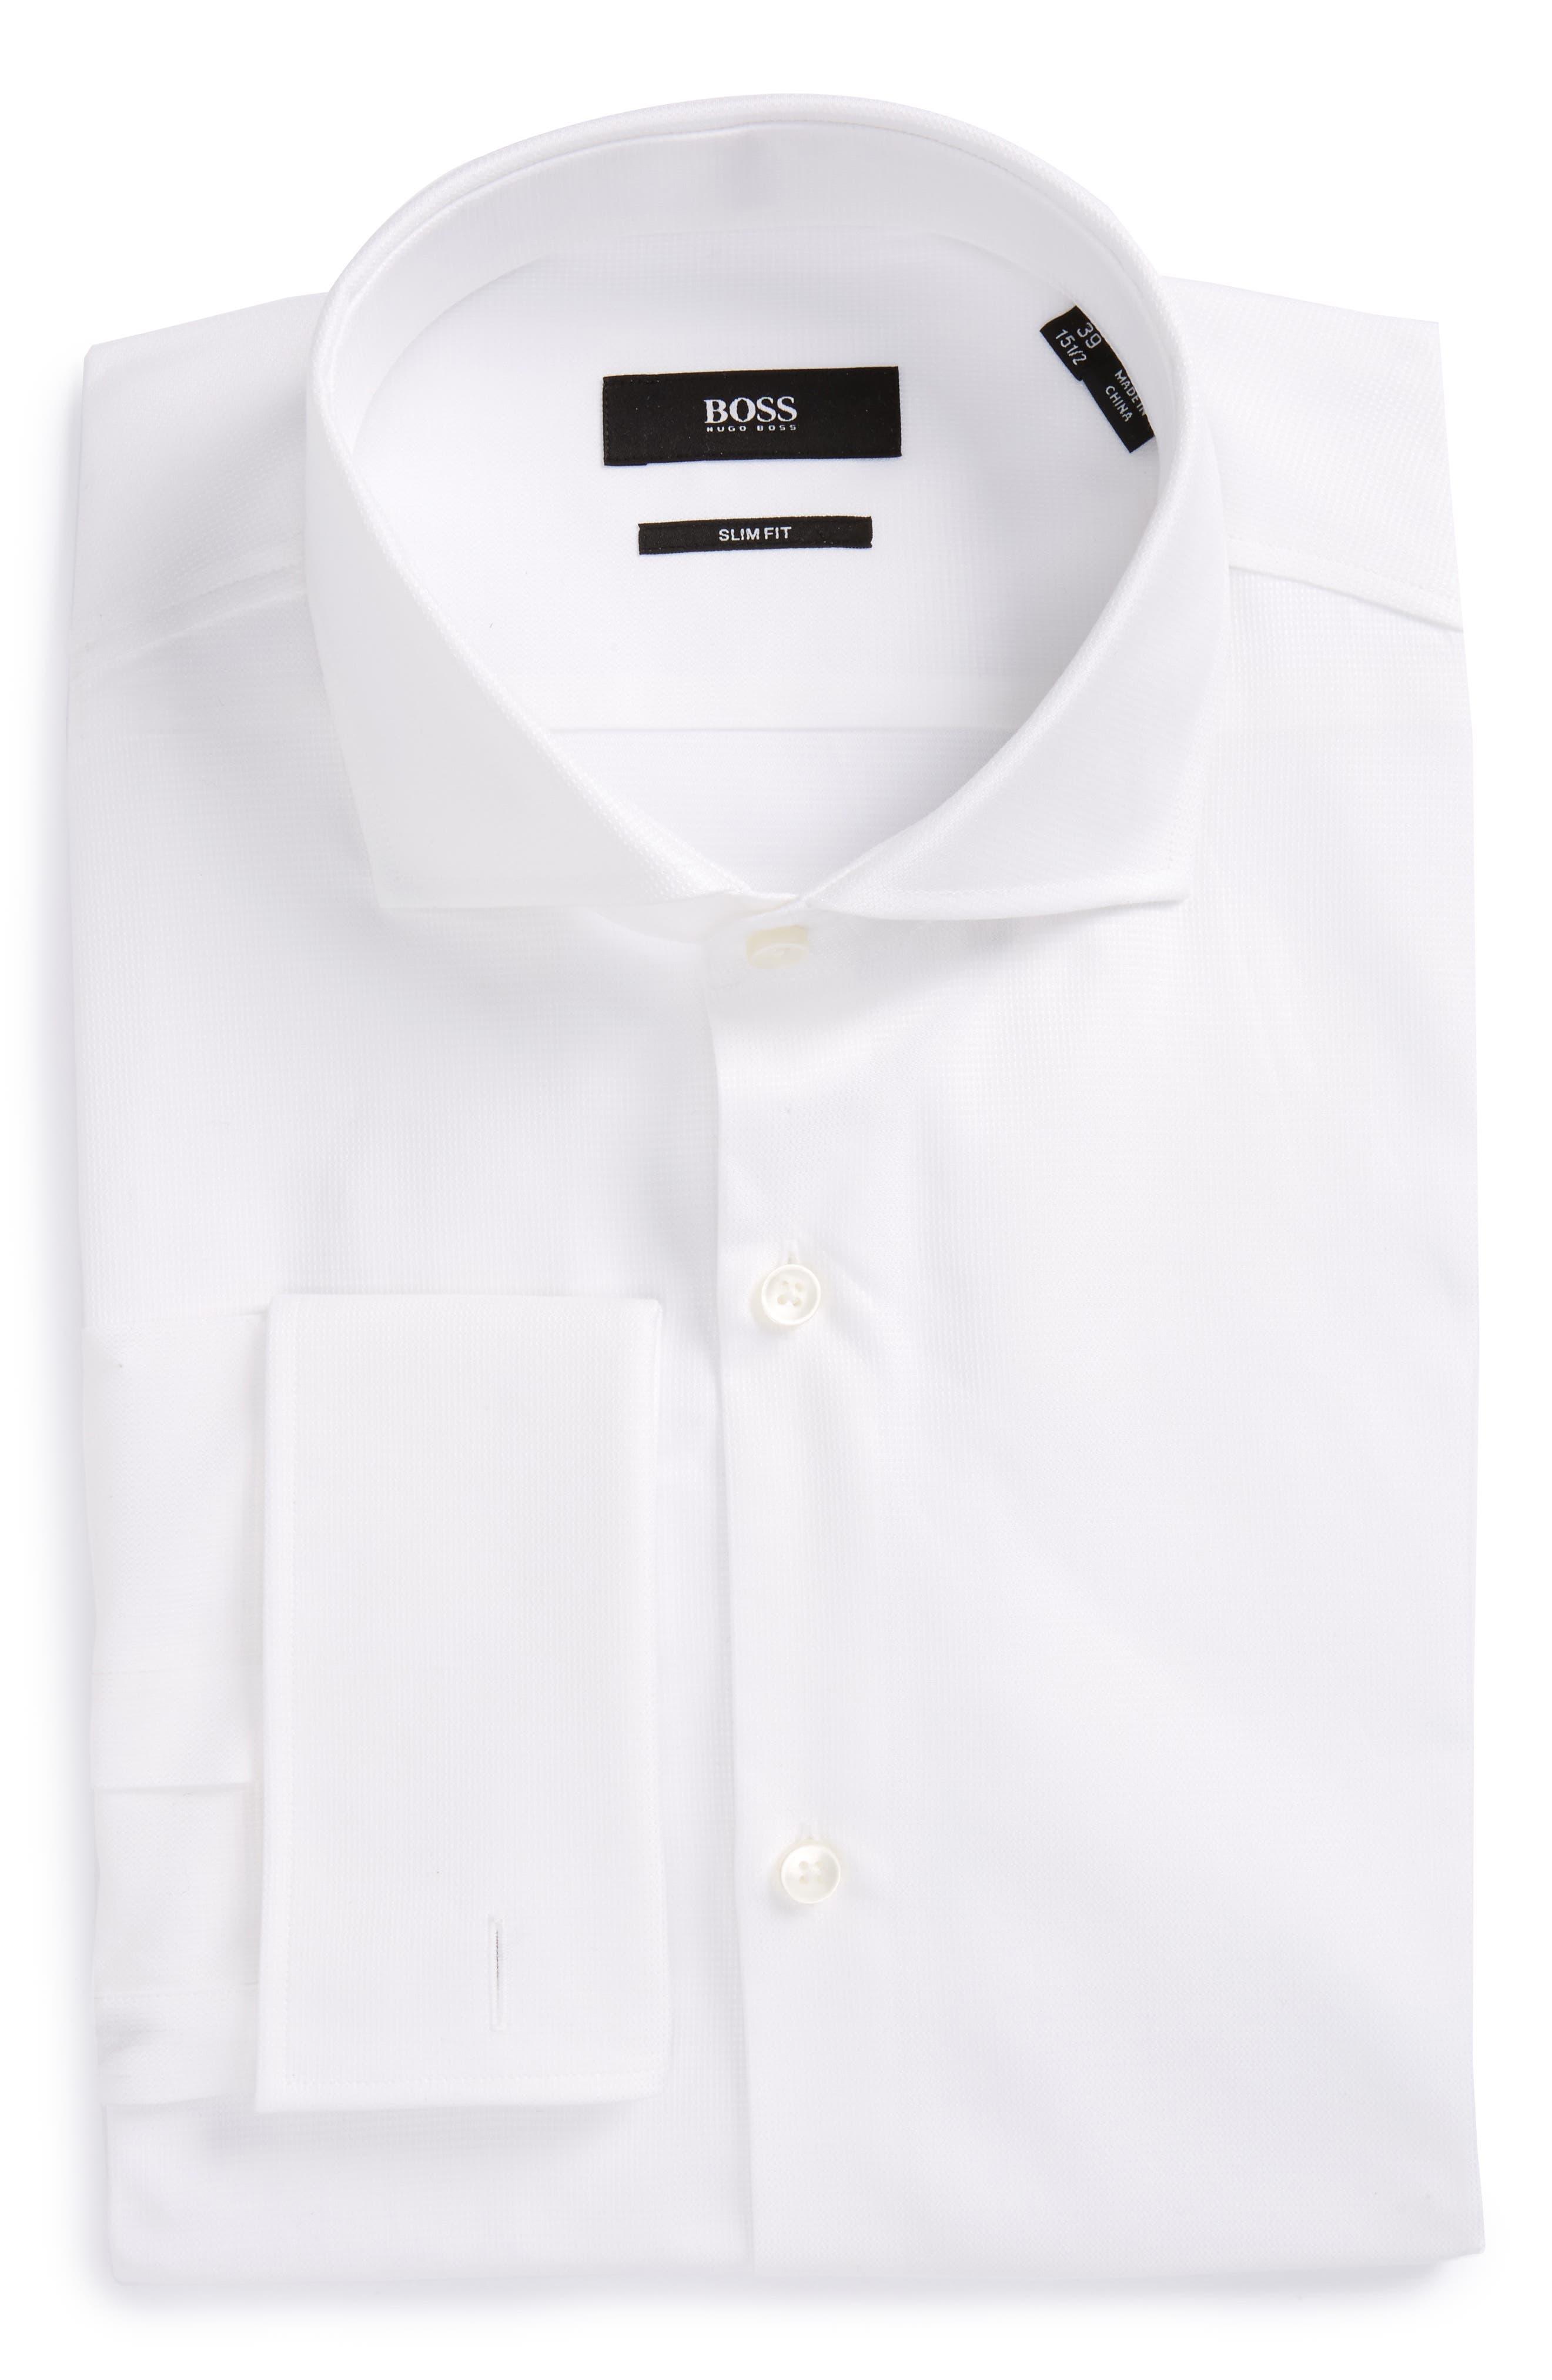 BOSS Jaiden Slim Fit Solid French Cuff Dress Shirt